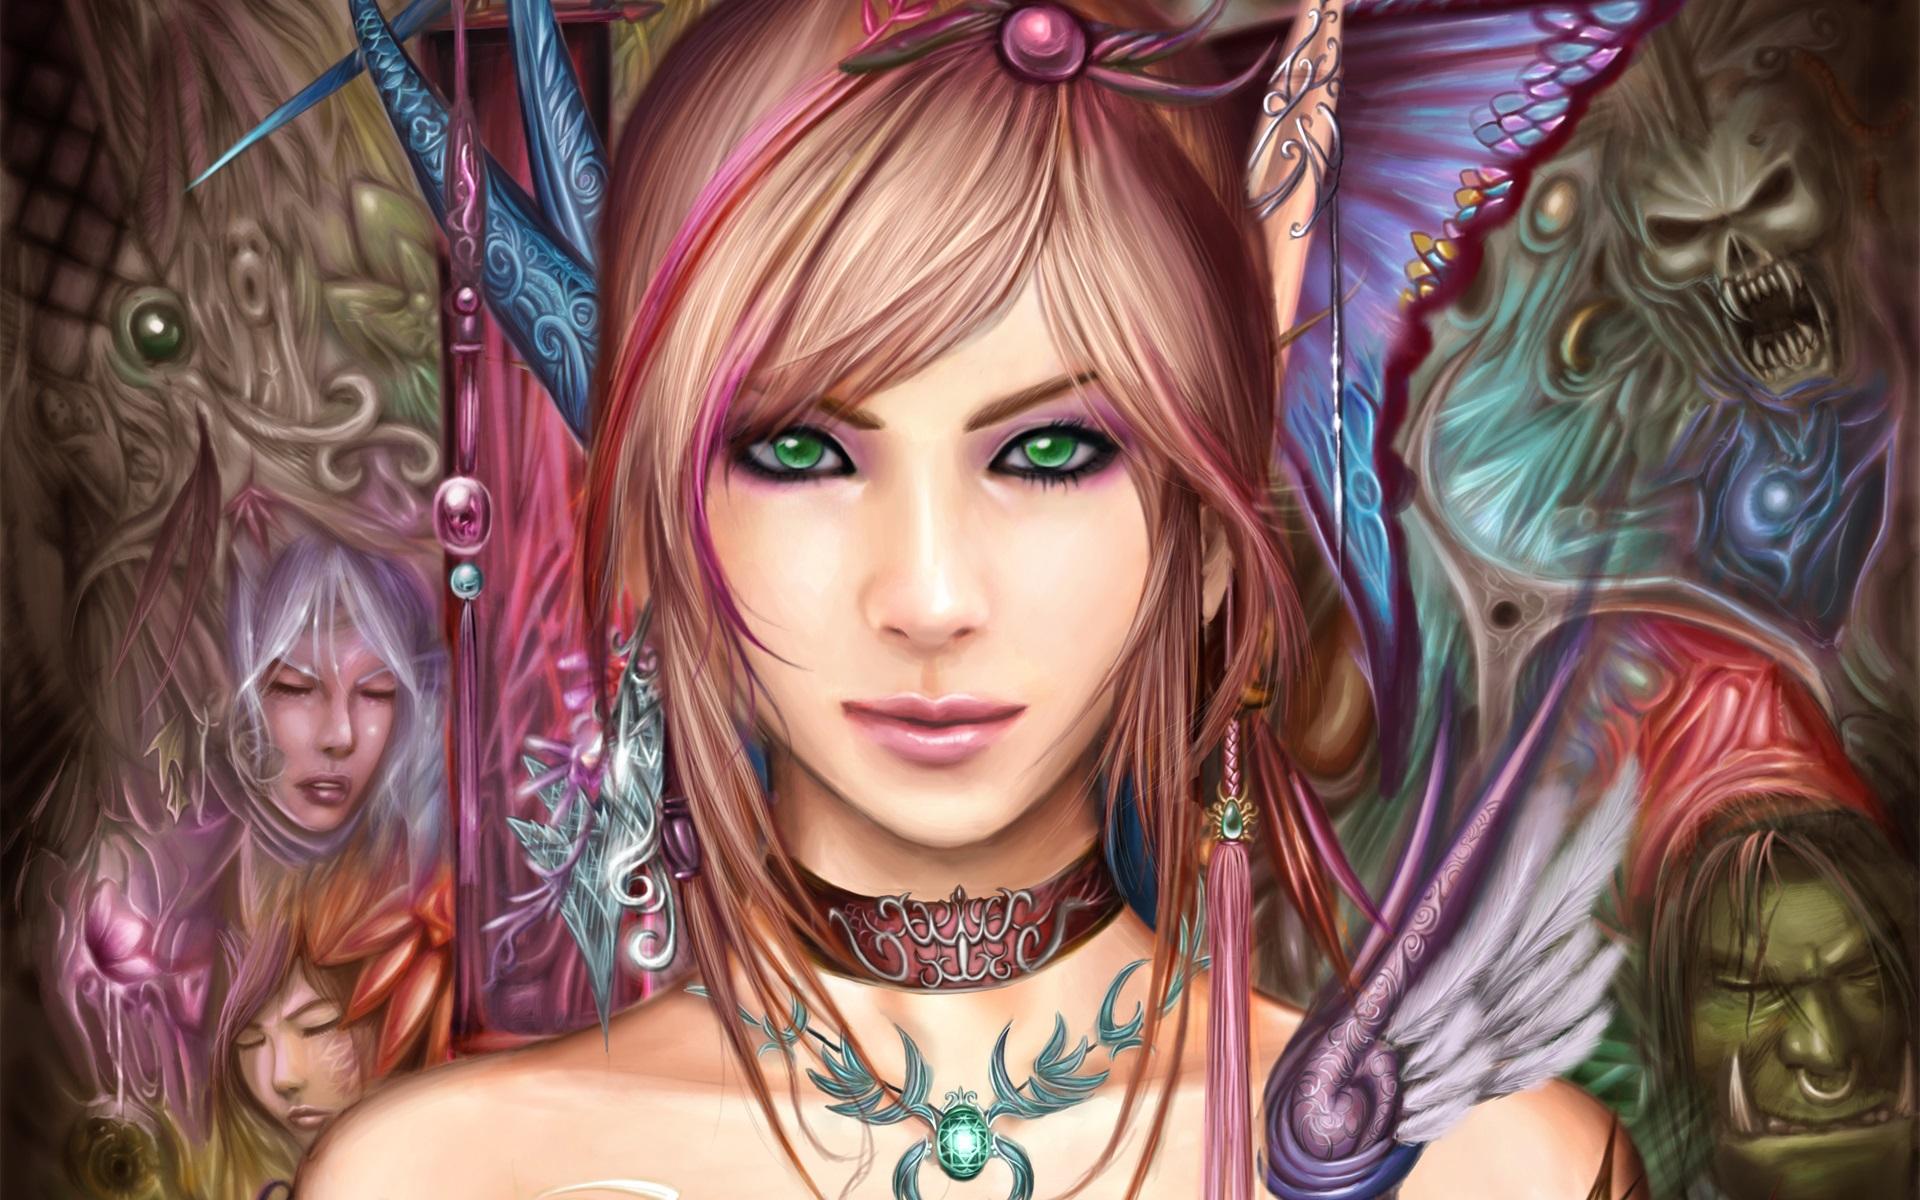 Beautiful fantasy girl, green eyes, brown hair Wallpaper - 1920x1200